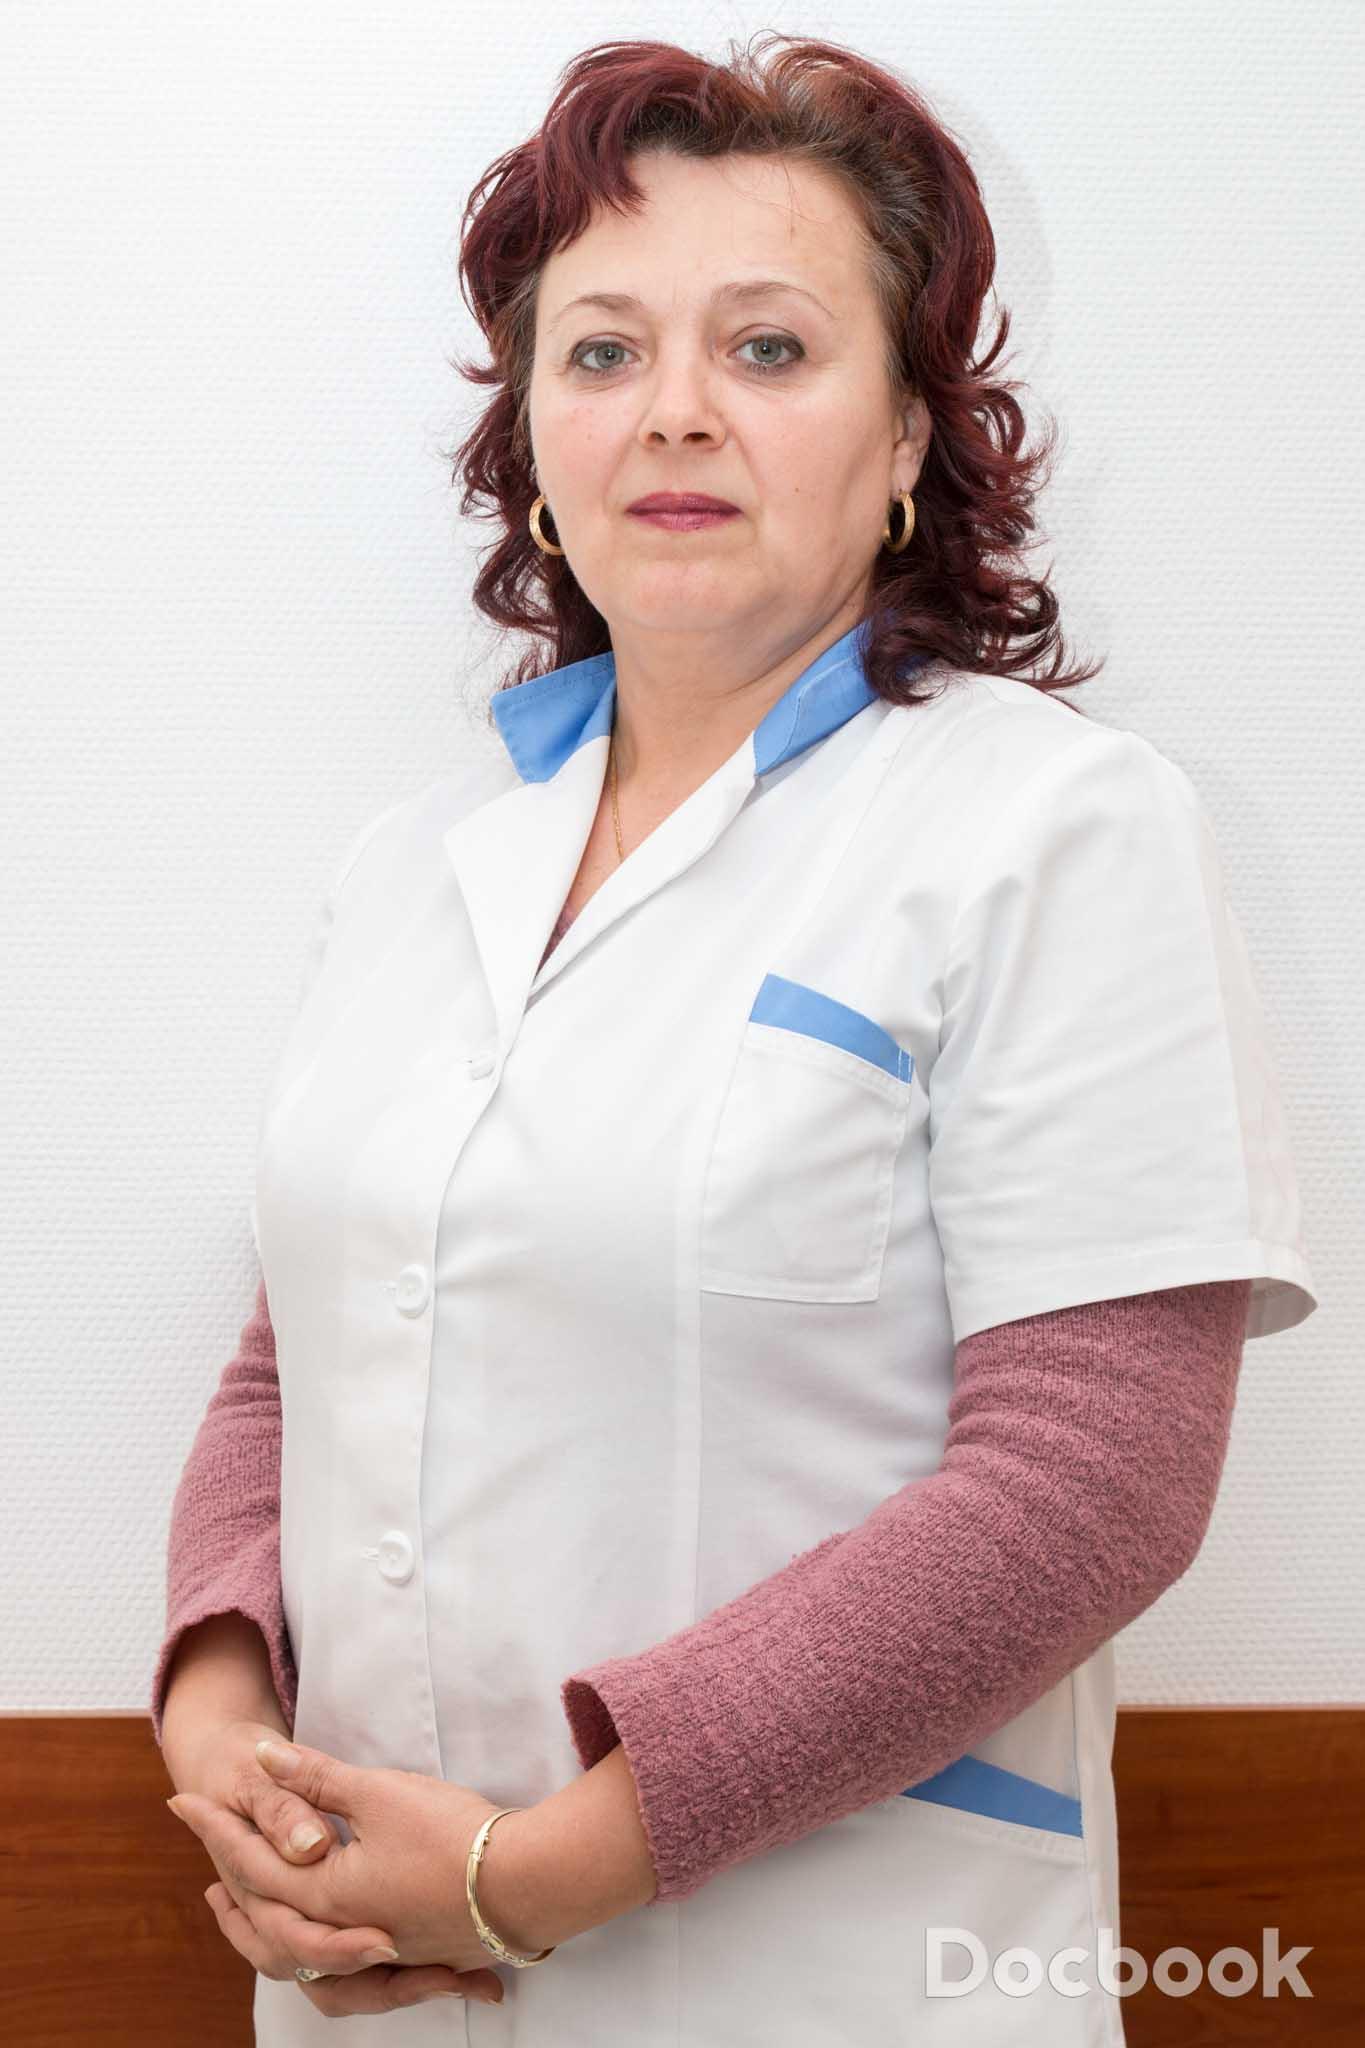 Dr. Luminita Tanase